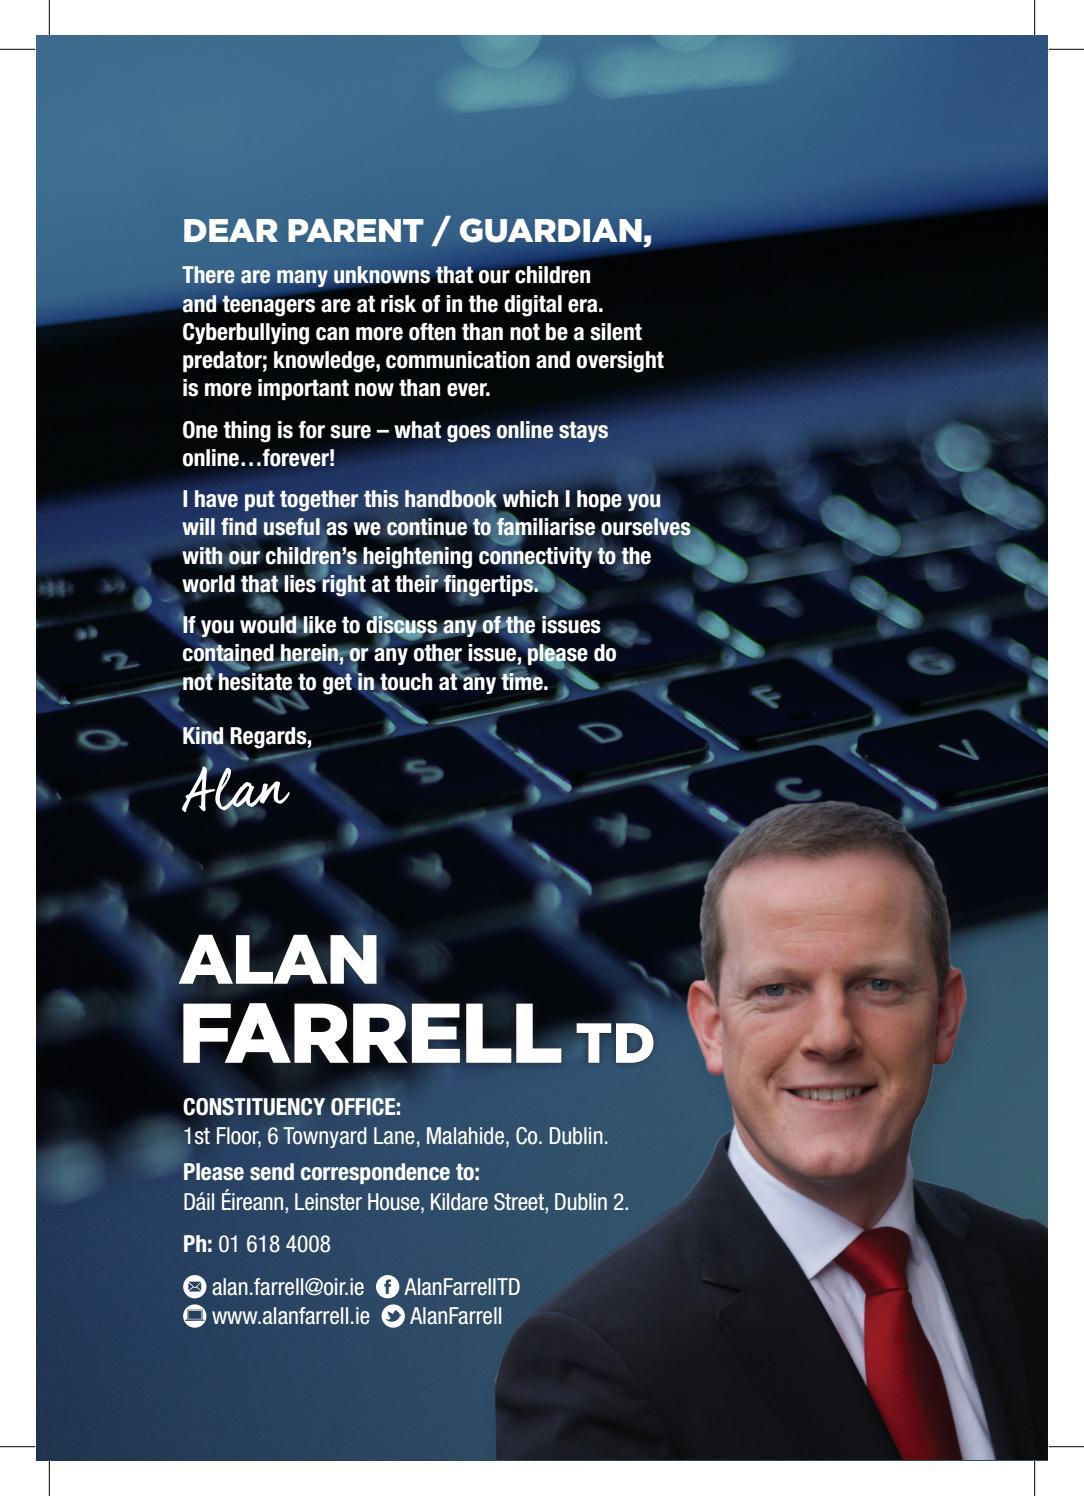 9e08ec546b2a Cyber Safety Booklet - Alan Farrell TD by Alan Farrell - issuu